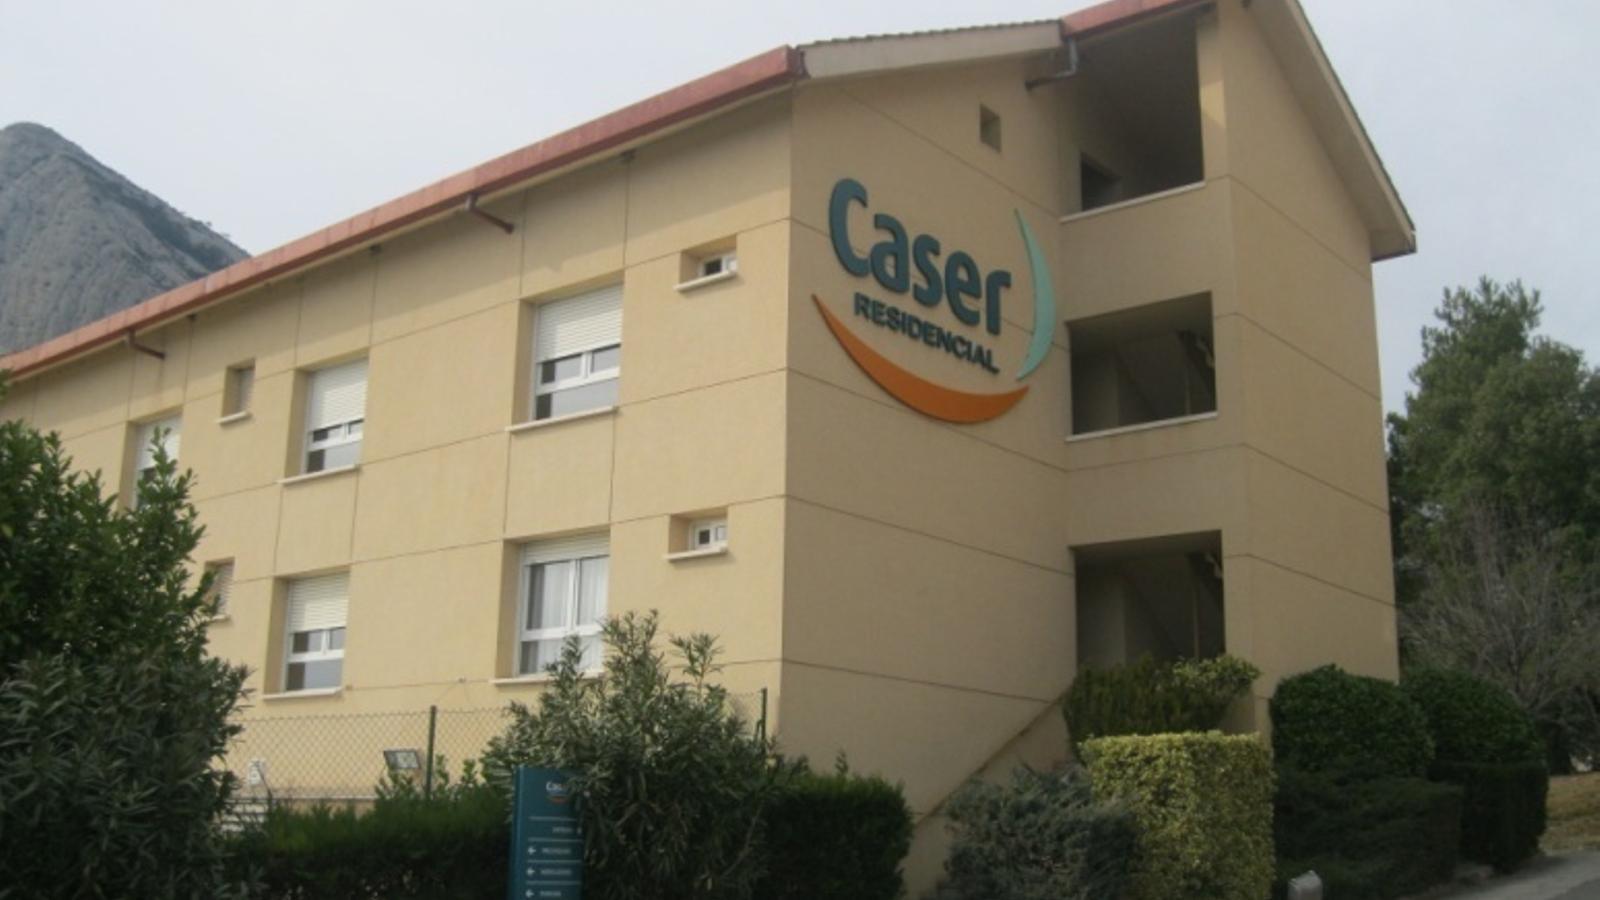 La residència d'Oliana. / CASER